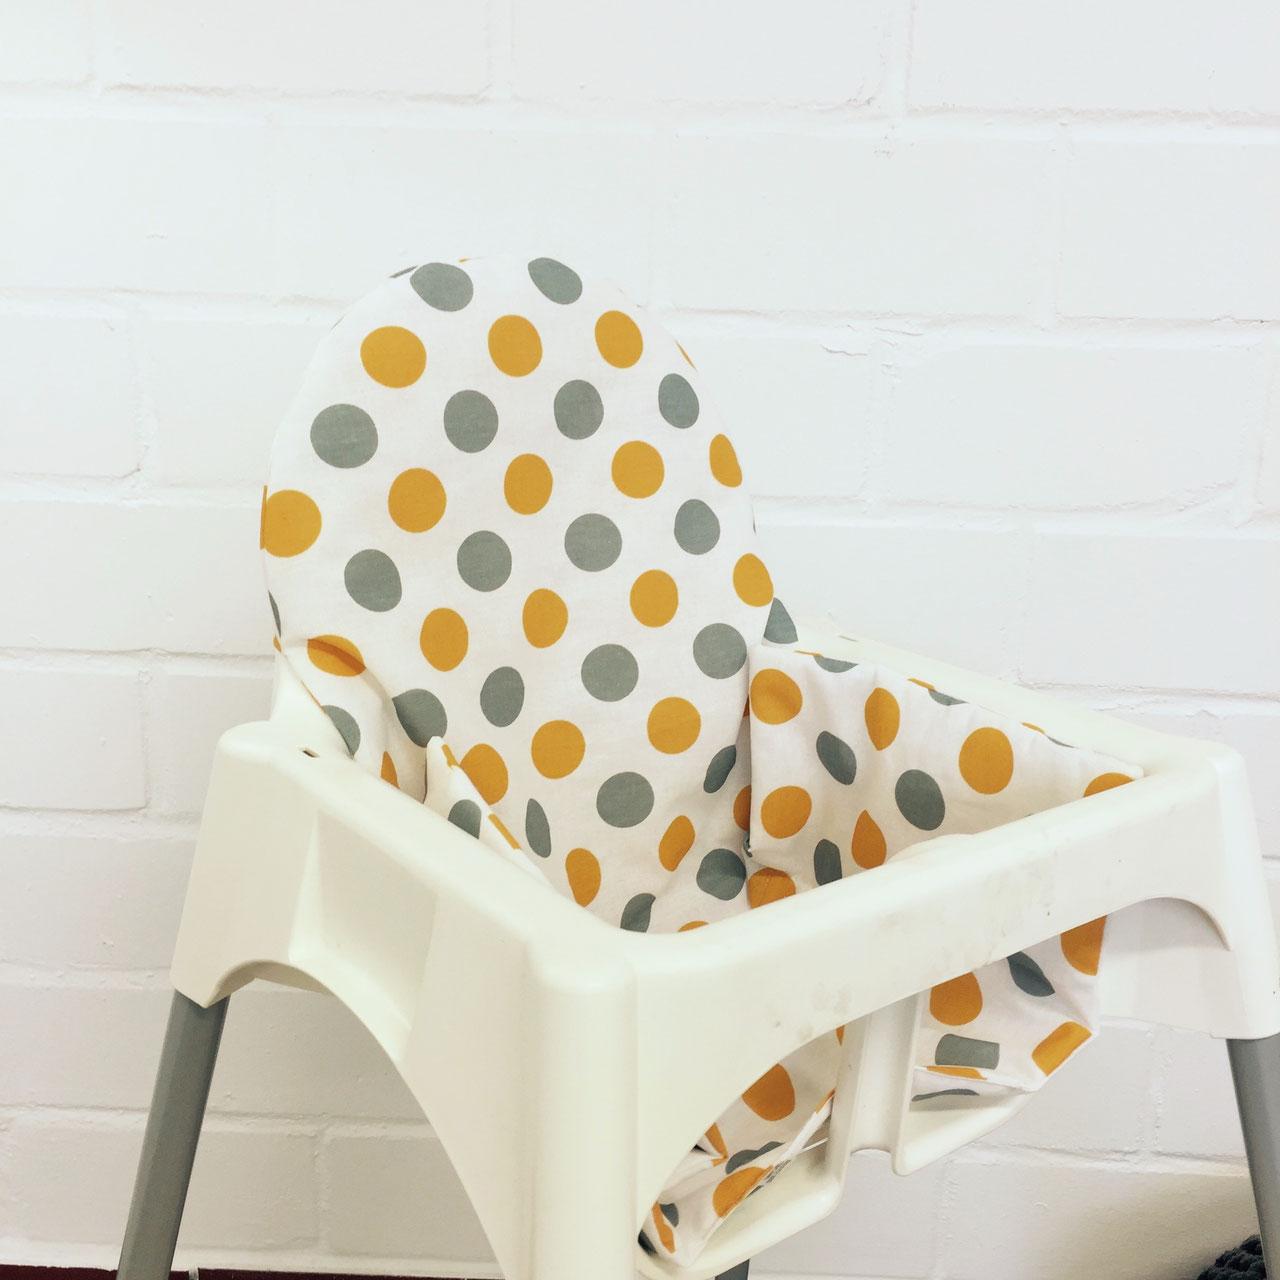 sitzkissen ikea puckdaddy wickelaufs tze f r deine ikea kommode. Black Bedroom Furniture Sets. Home Design Ideas